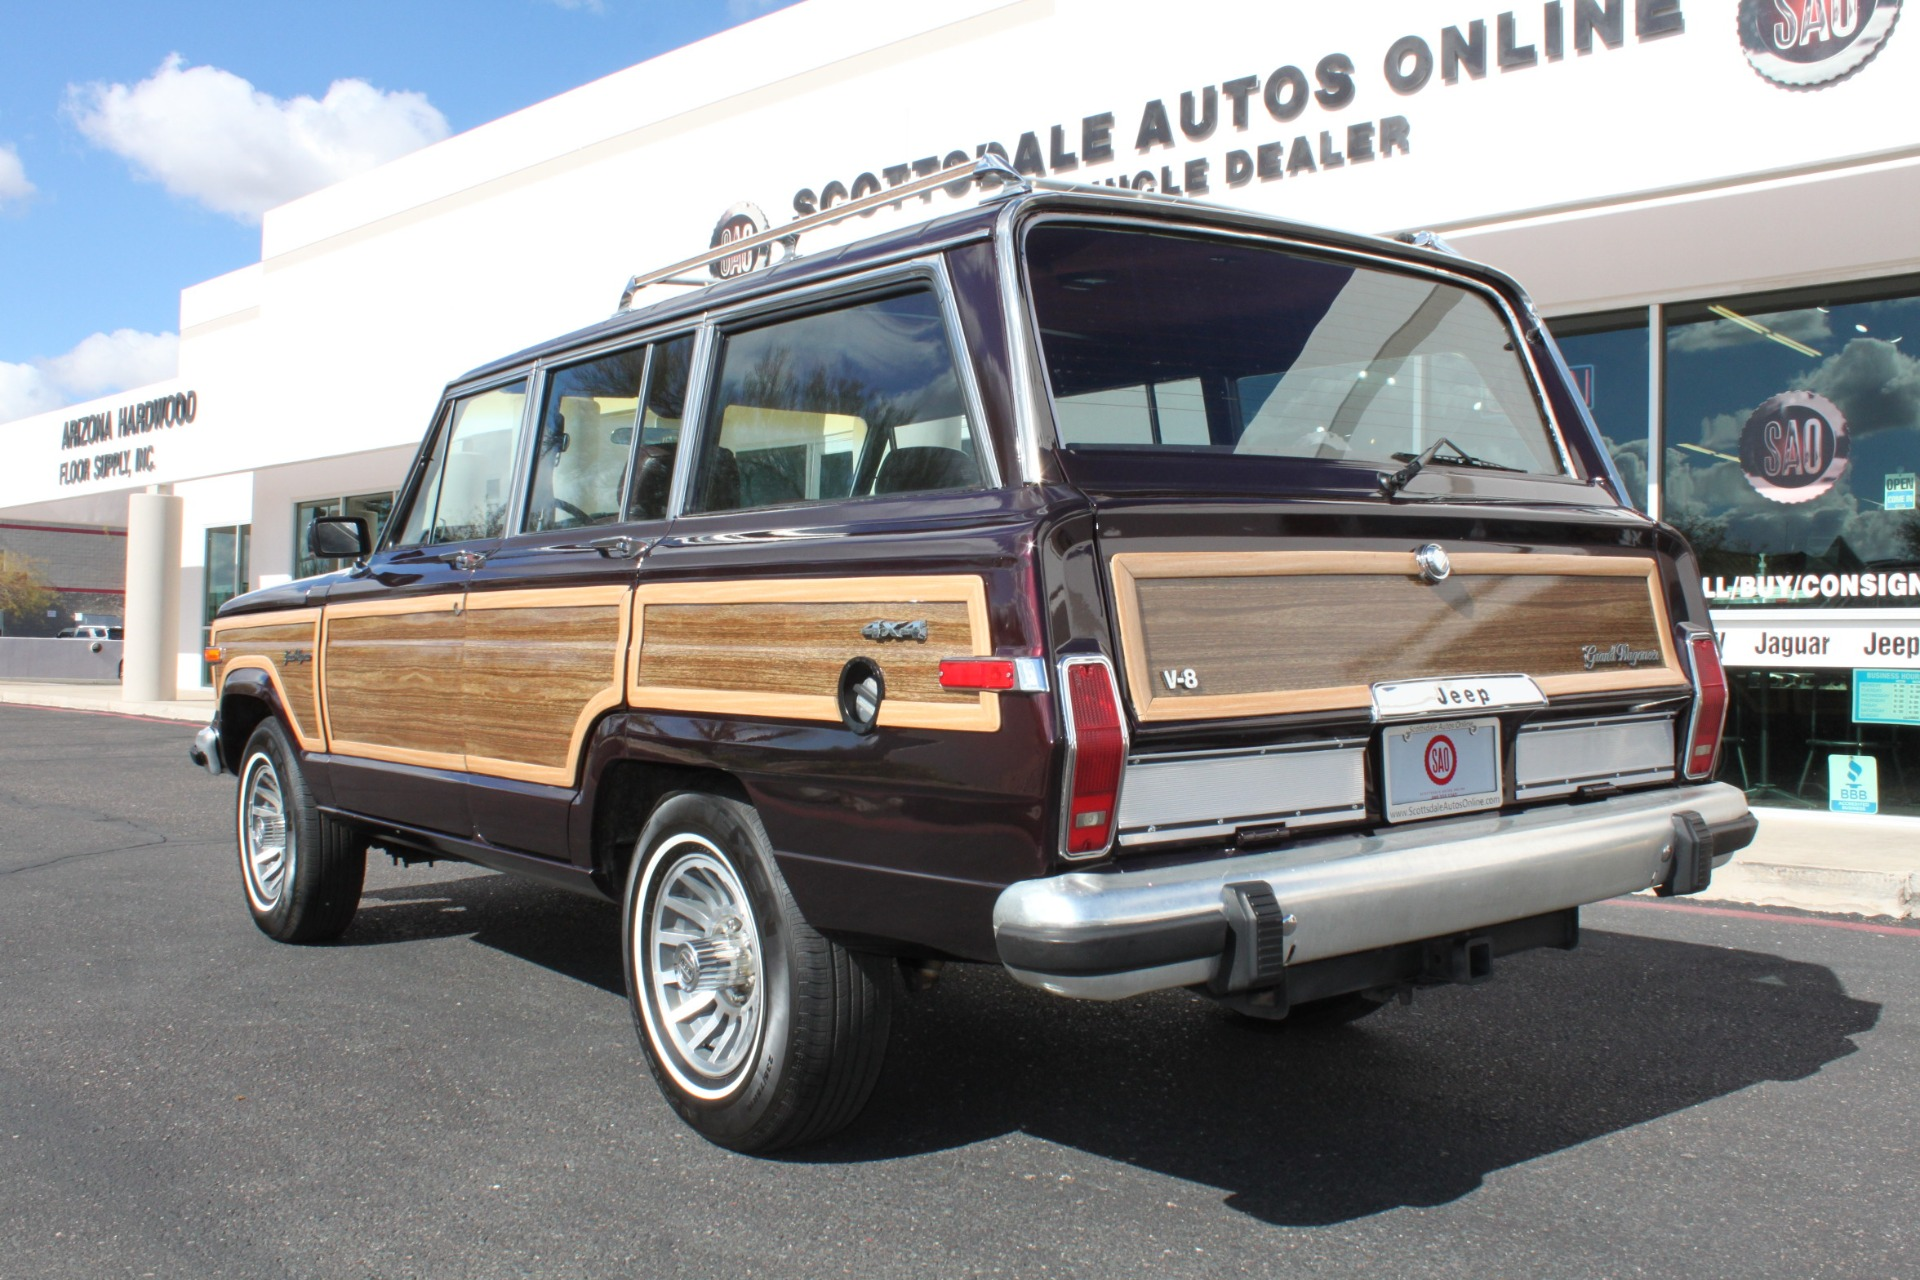 Used-1989-Jeep-Grand-Wagoneer-Grand-Wagoneer